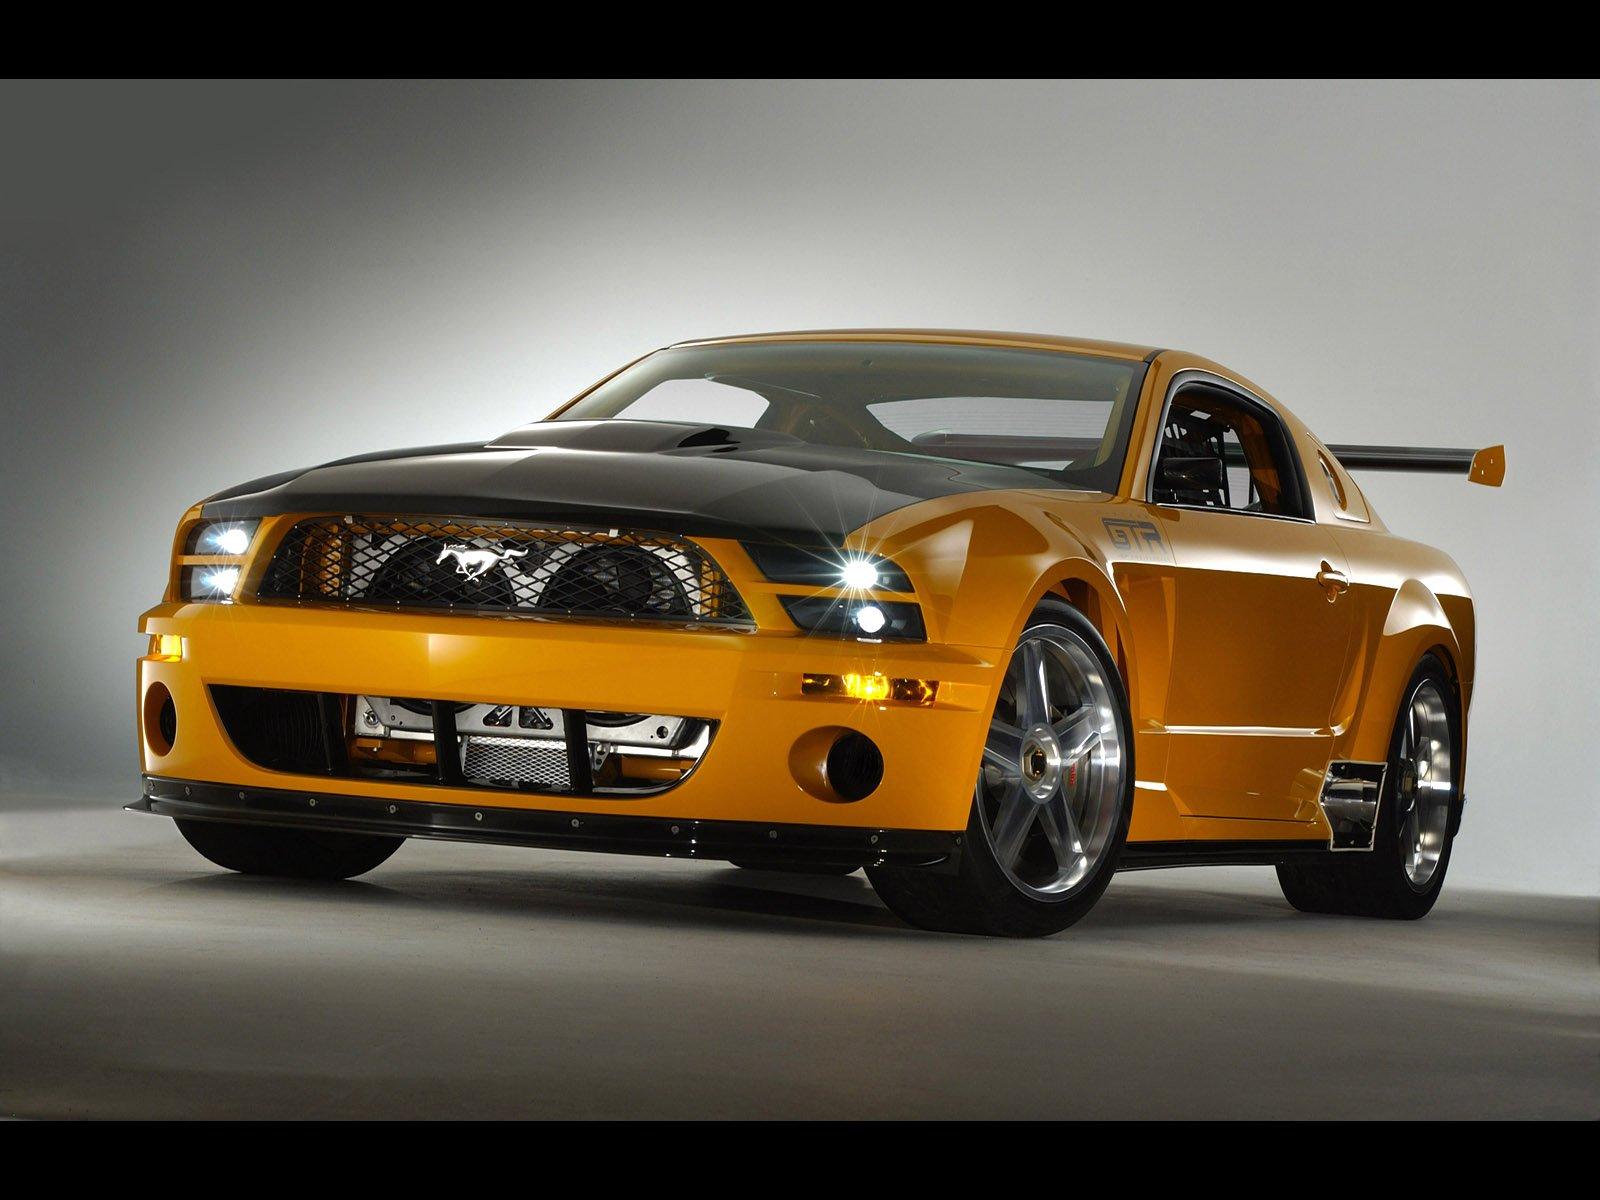 Lamborgini Sports Car Hd Wallpaper Fast Auto Mustang Gt